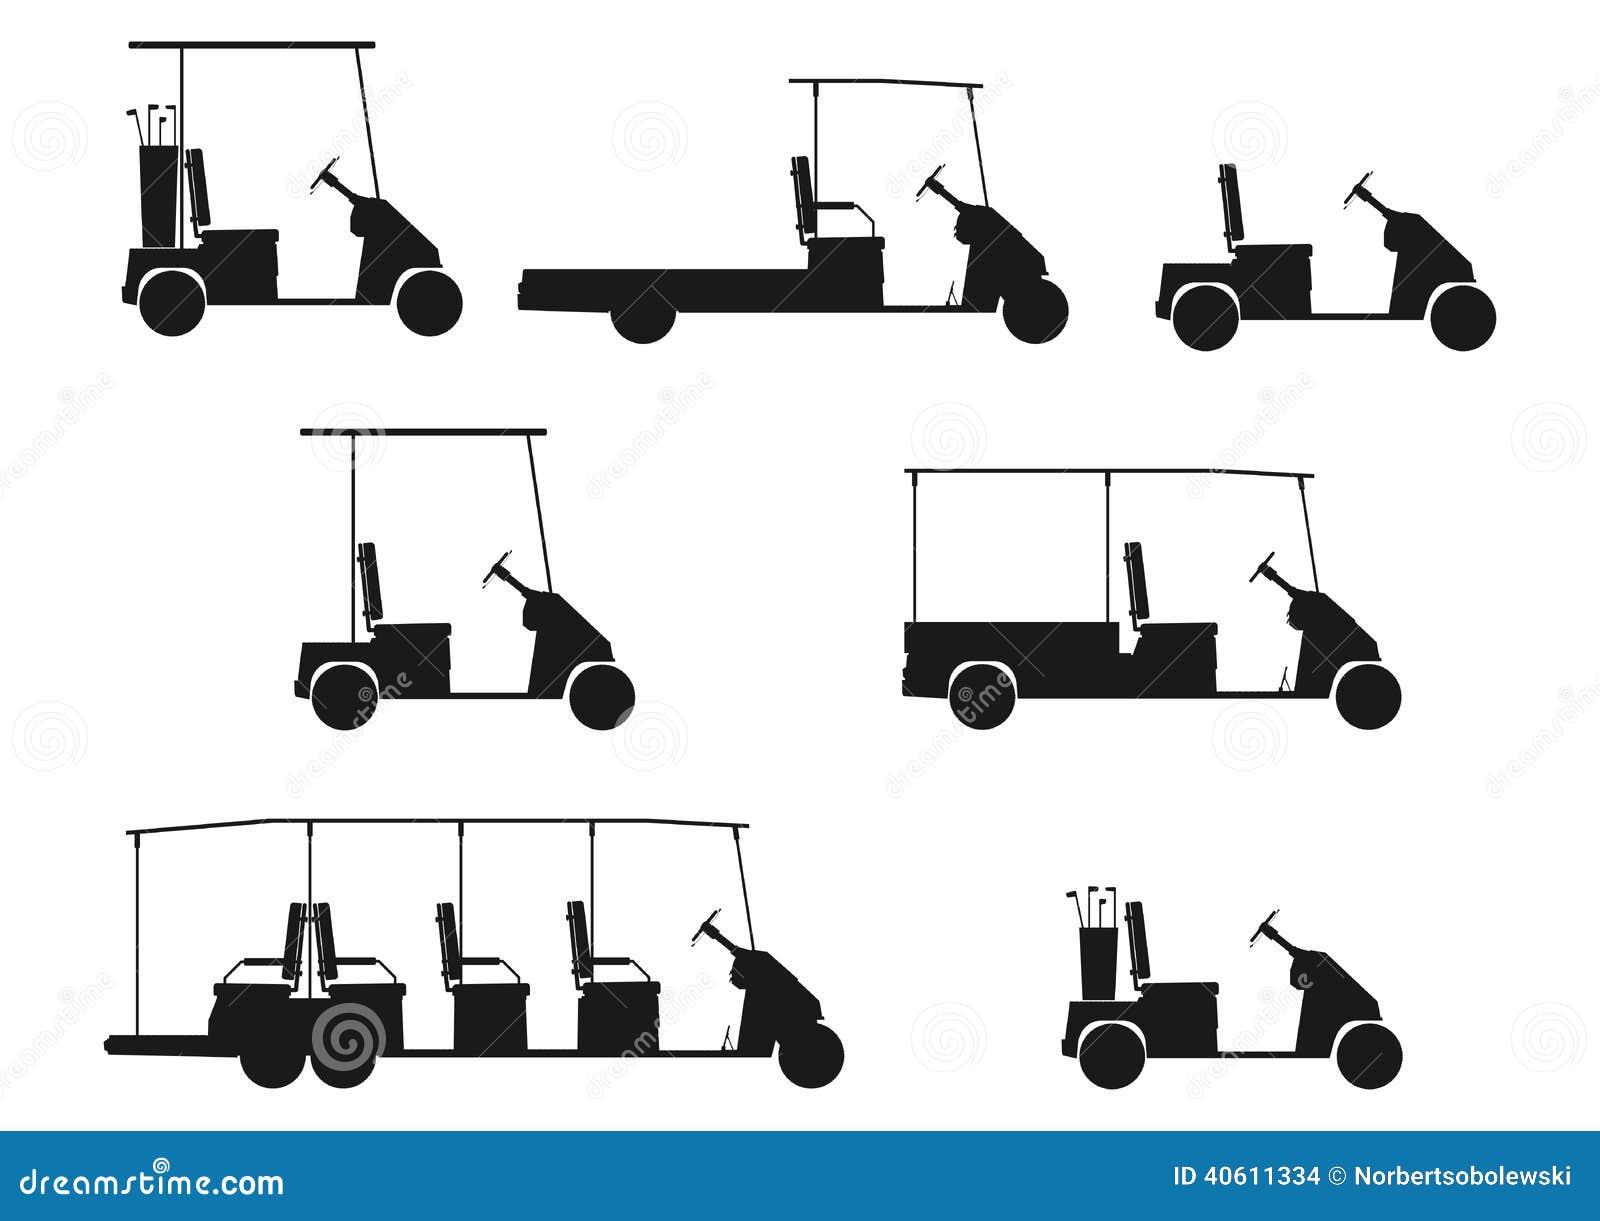 Image Result For Golf Cart Trailer For Travel Trailer